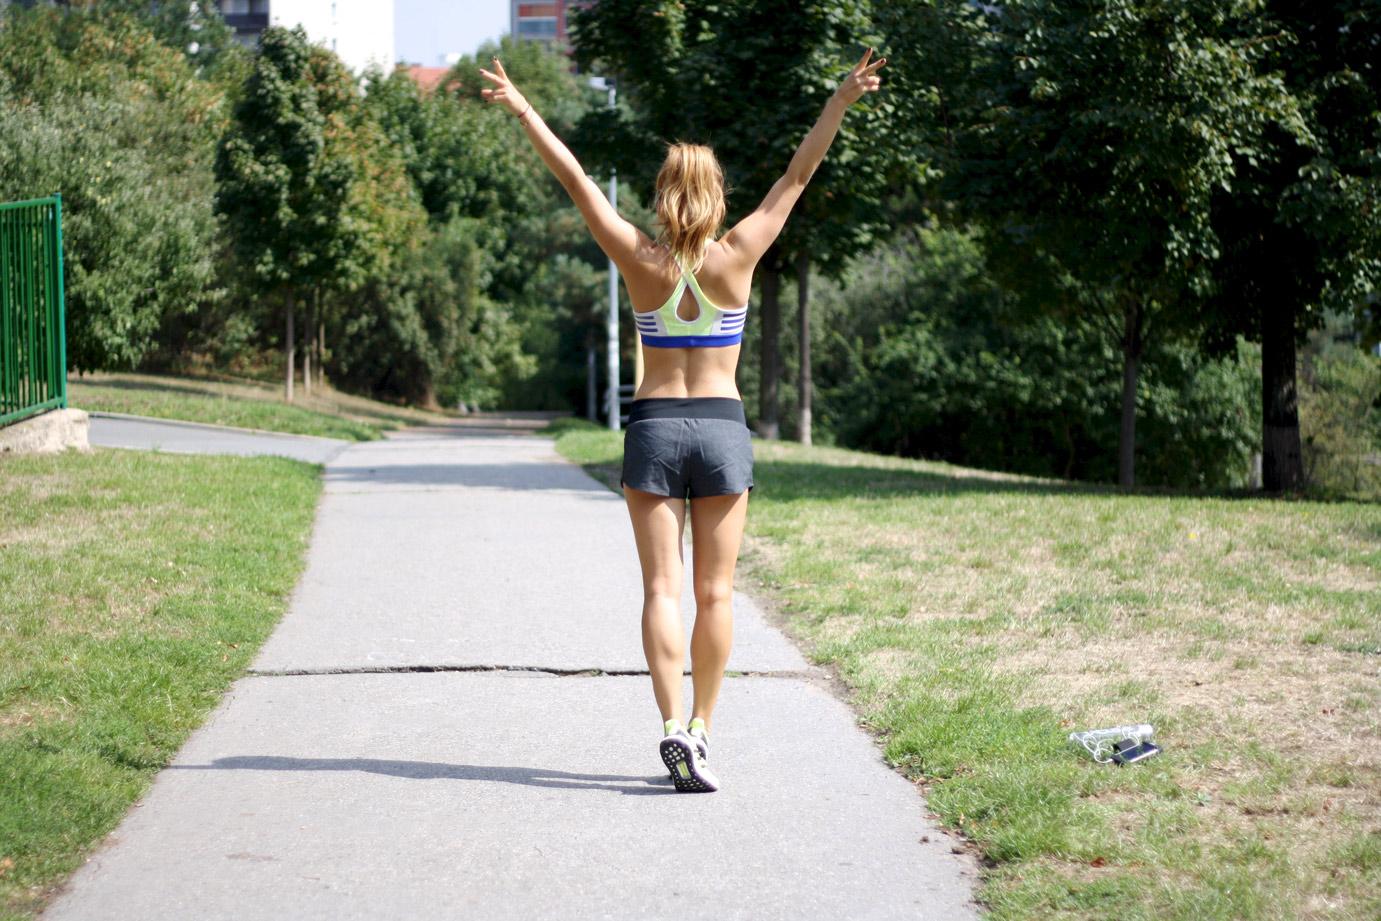 #ADIDASBLOGGERSCHALLENGE - THE BEST RUNNING OUTFIT 10